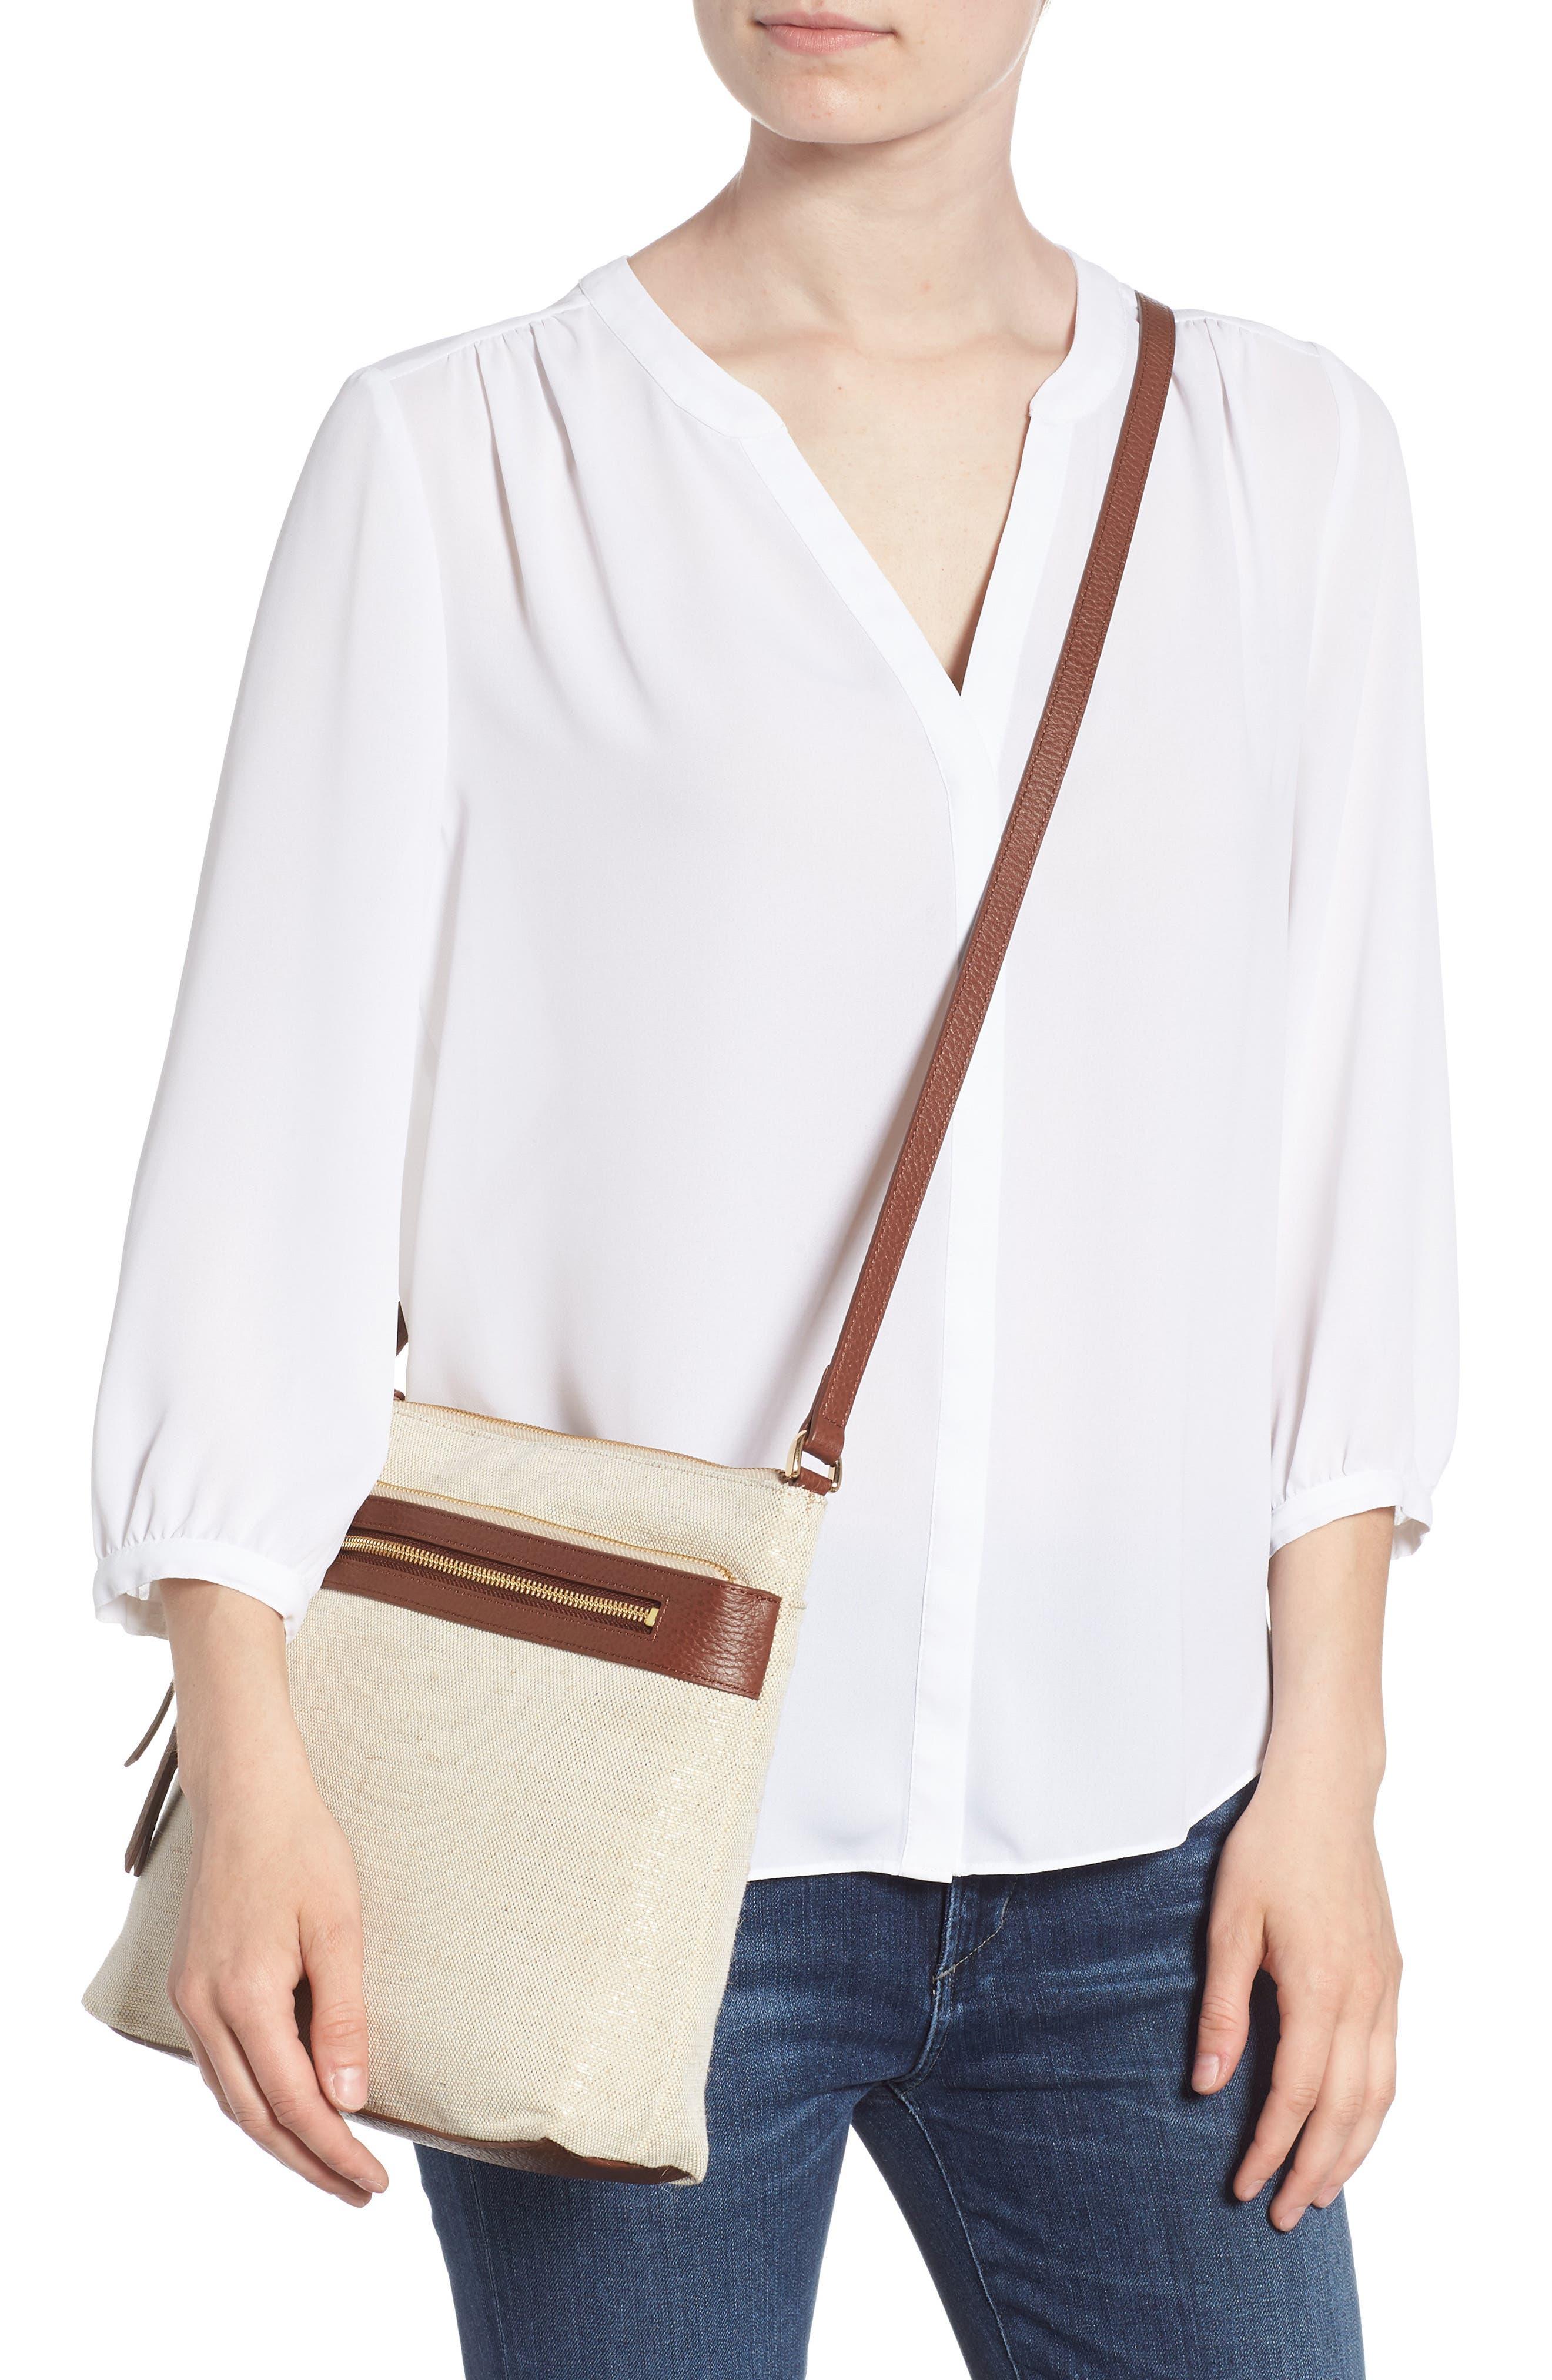 Kaison Linen & Leather Crossbody Bag,                             Alternate thumbnail 2, color,                             NATURAL/ GOLD